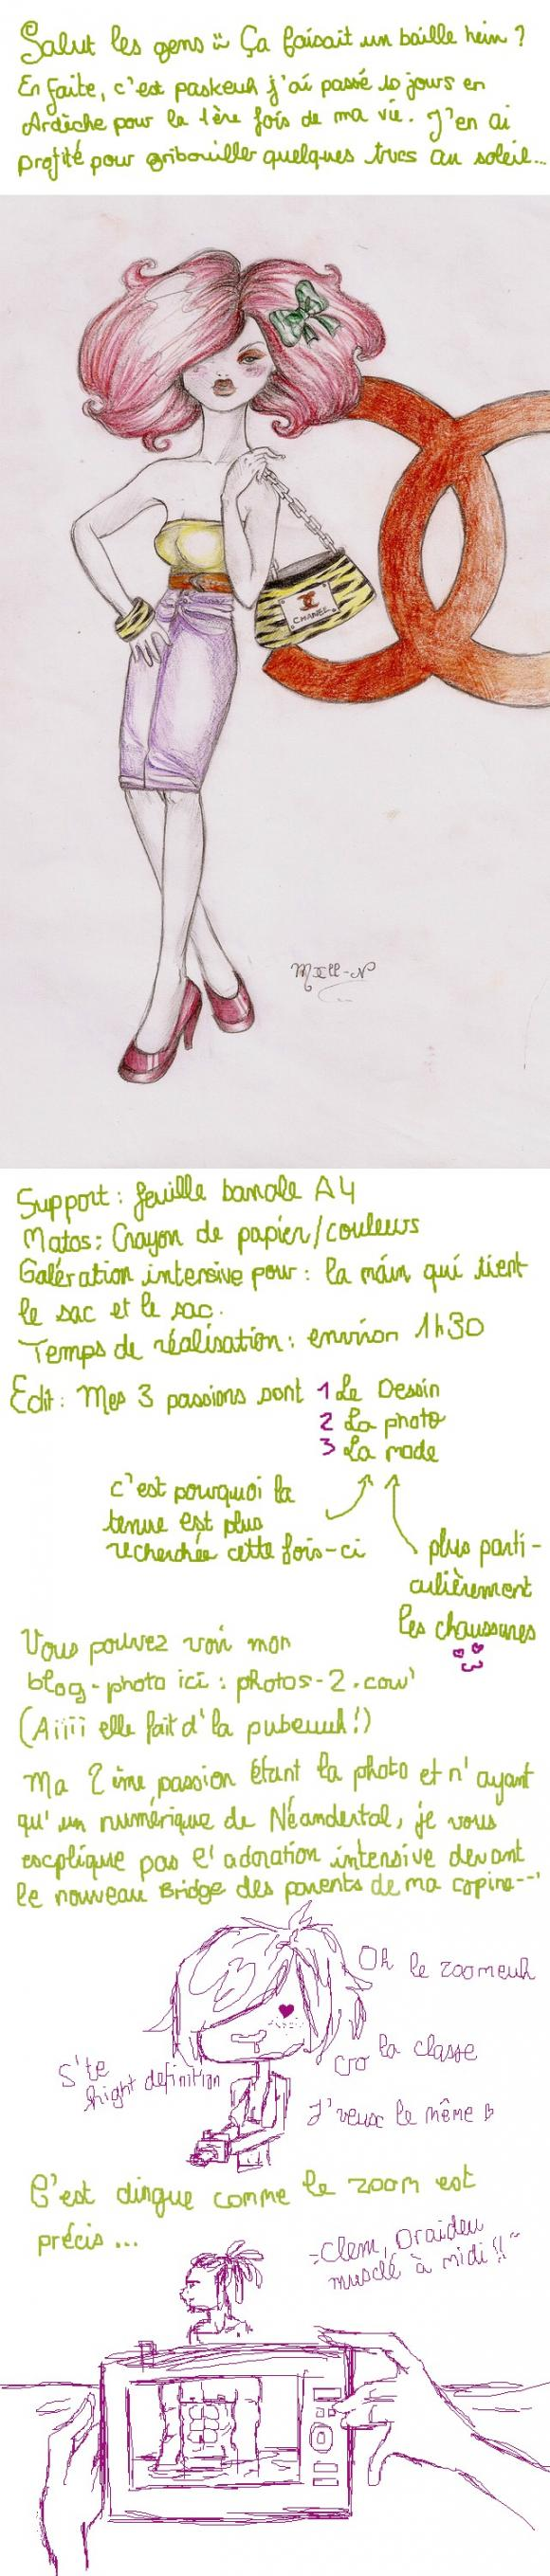 http://mell-n.cowblog.fr/images/Aedeche.jpg